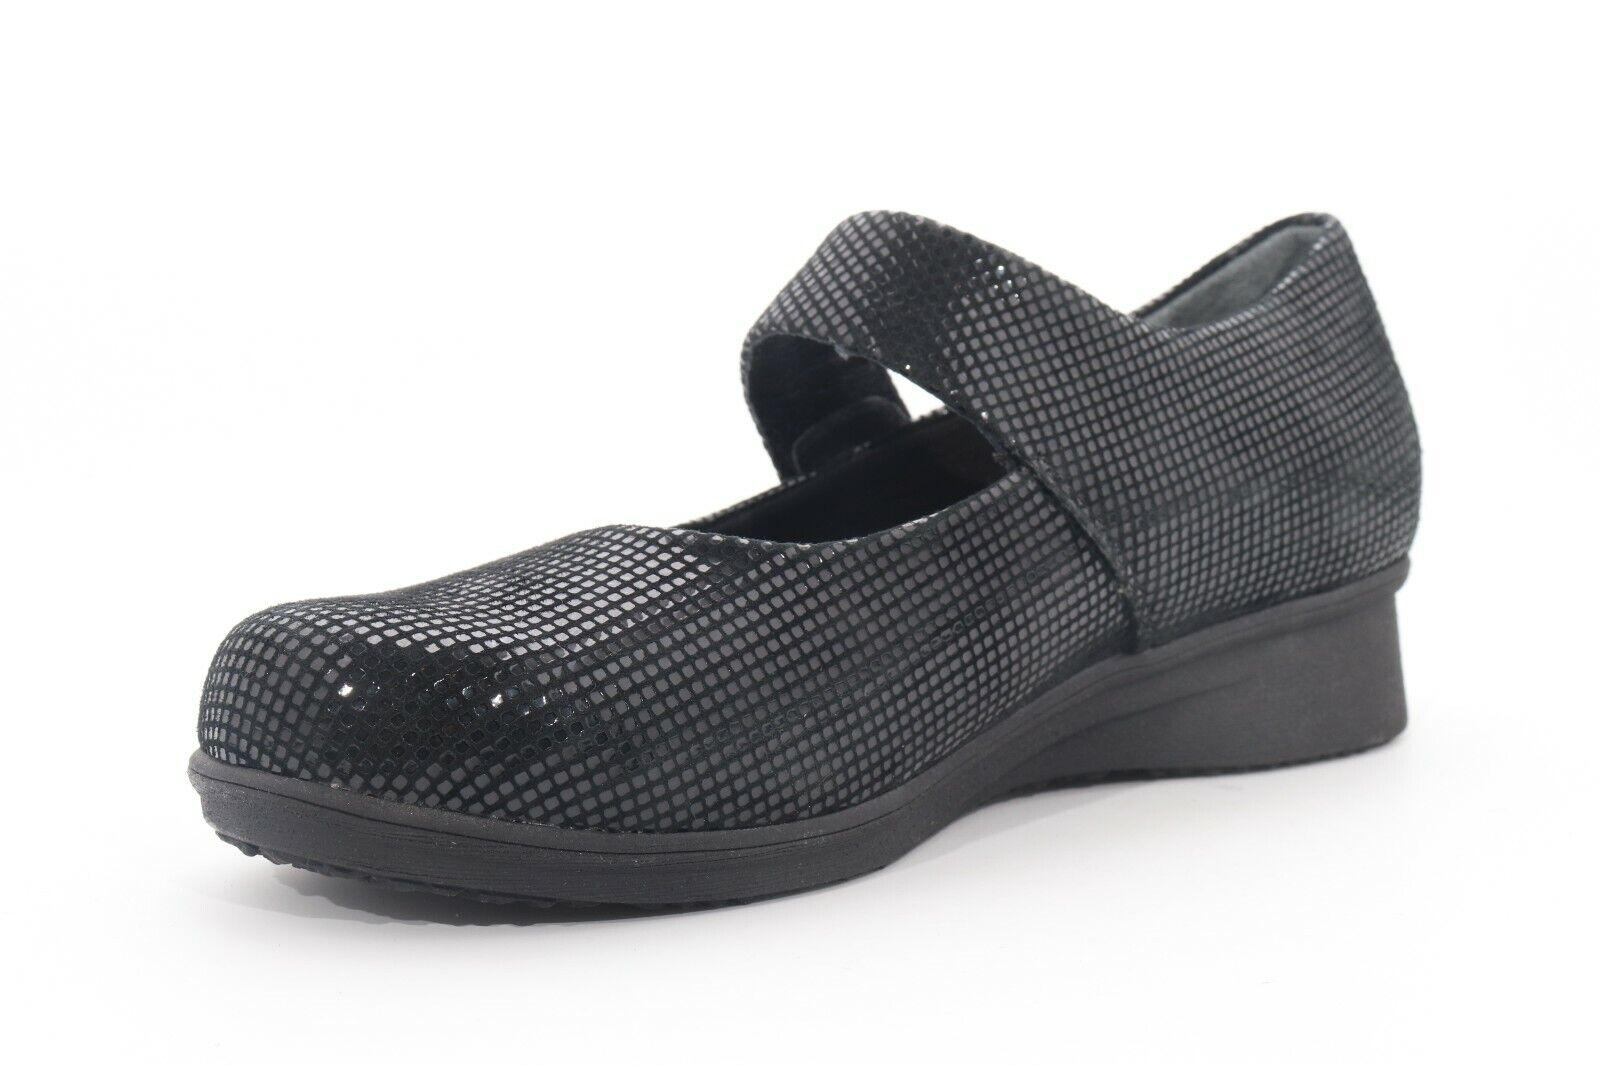 Abeo 24/7 Ella Mary Jane Casual Shoes Black Geo Size US 6